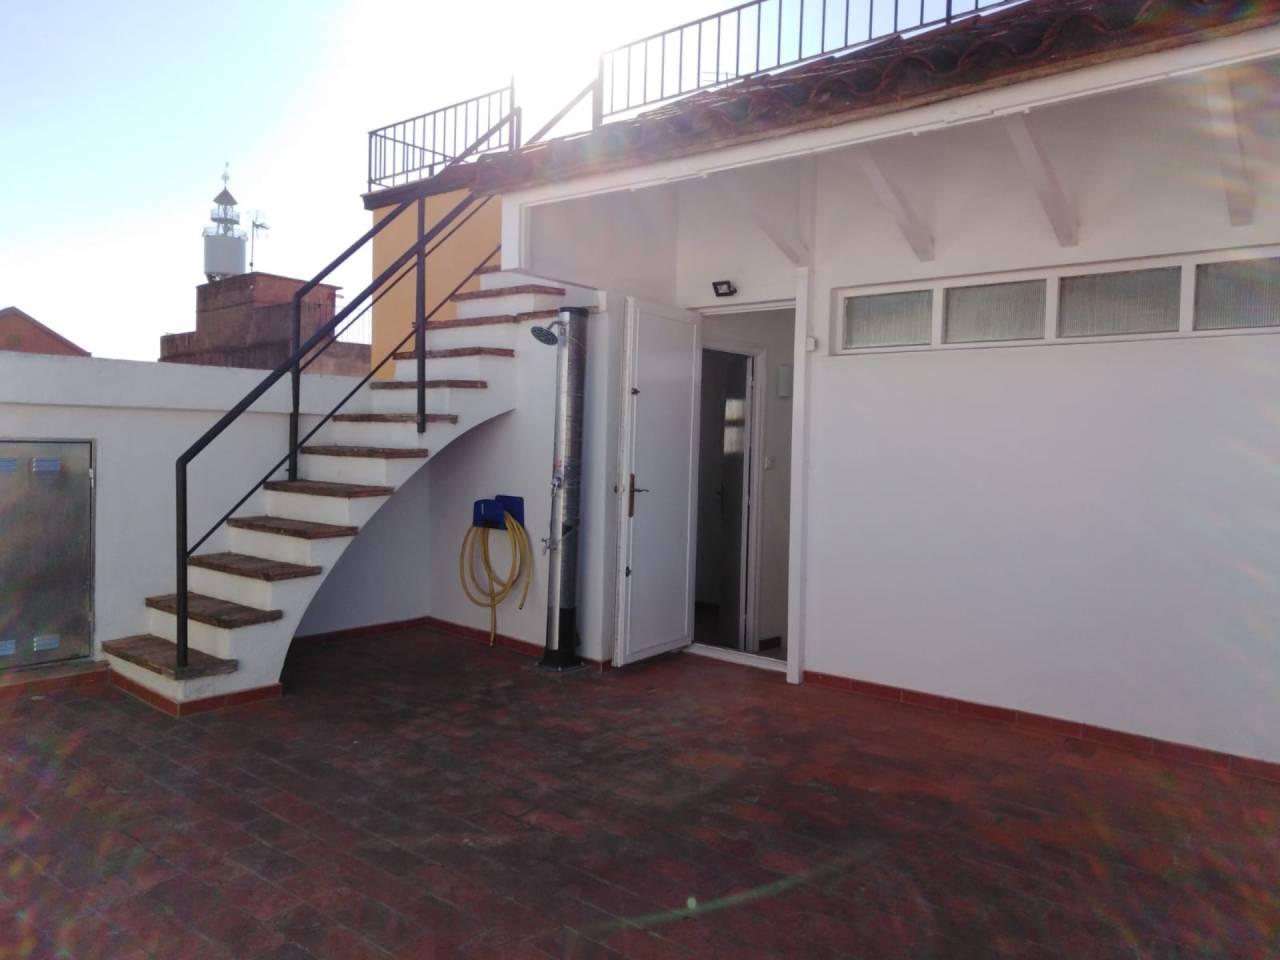 Alquiler Casa  Calle pi i maragall. Casa reformada zona cèntrica del poble, metres útils 190 m2 de 3